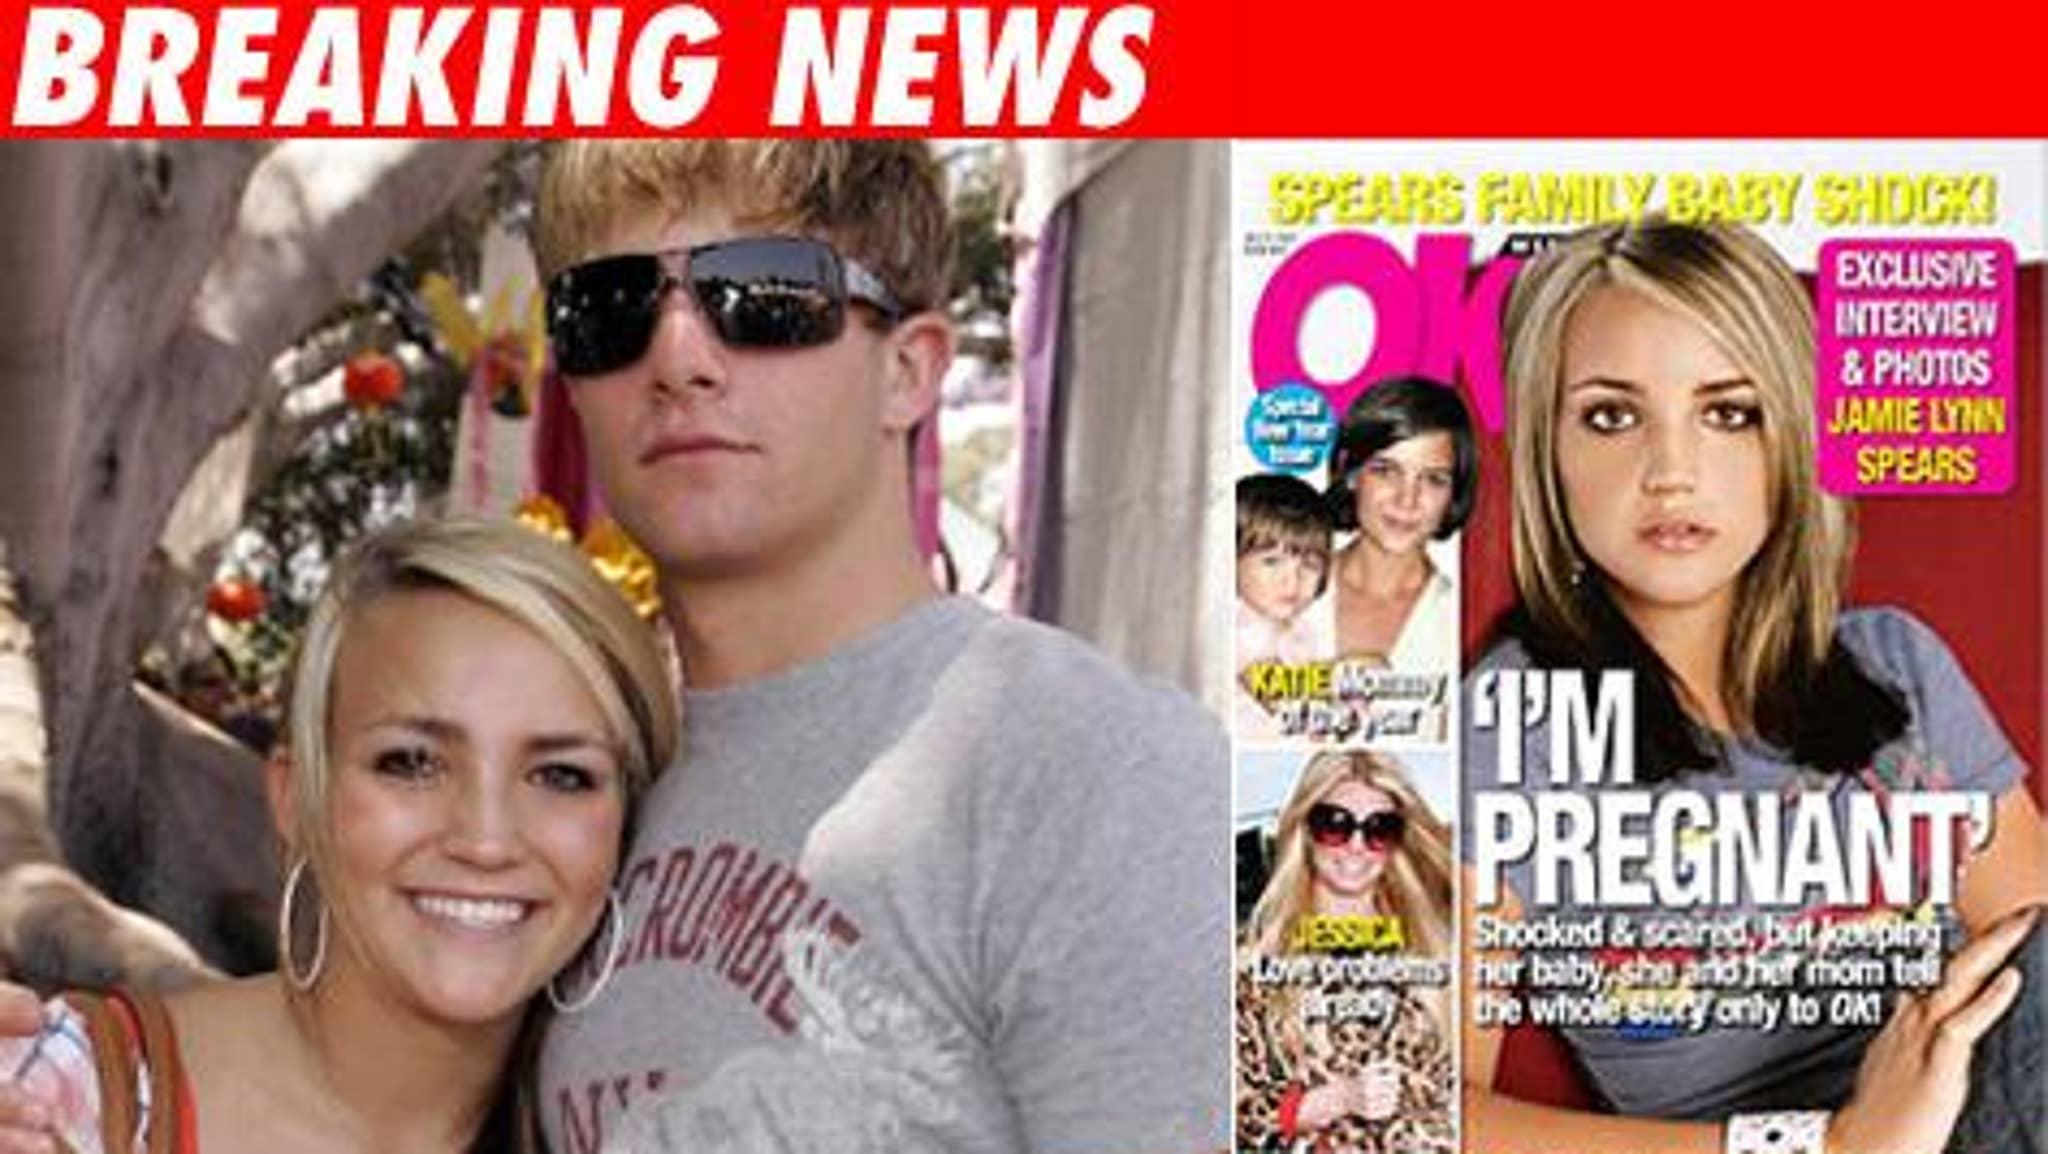 16 Year Old Jamie Lynn Spears Is Pregnant